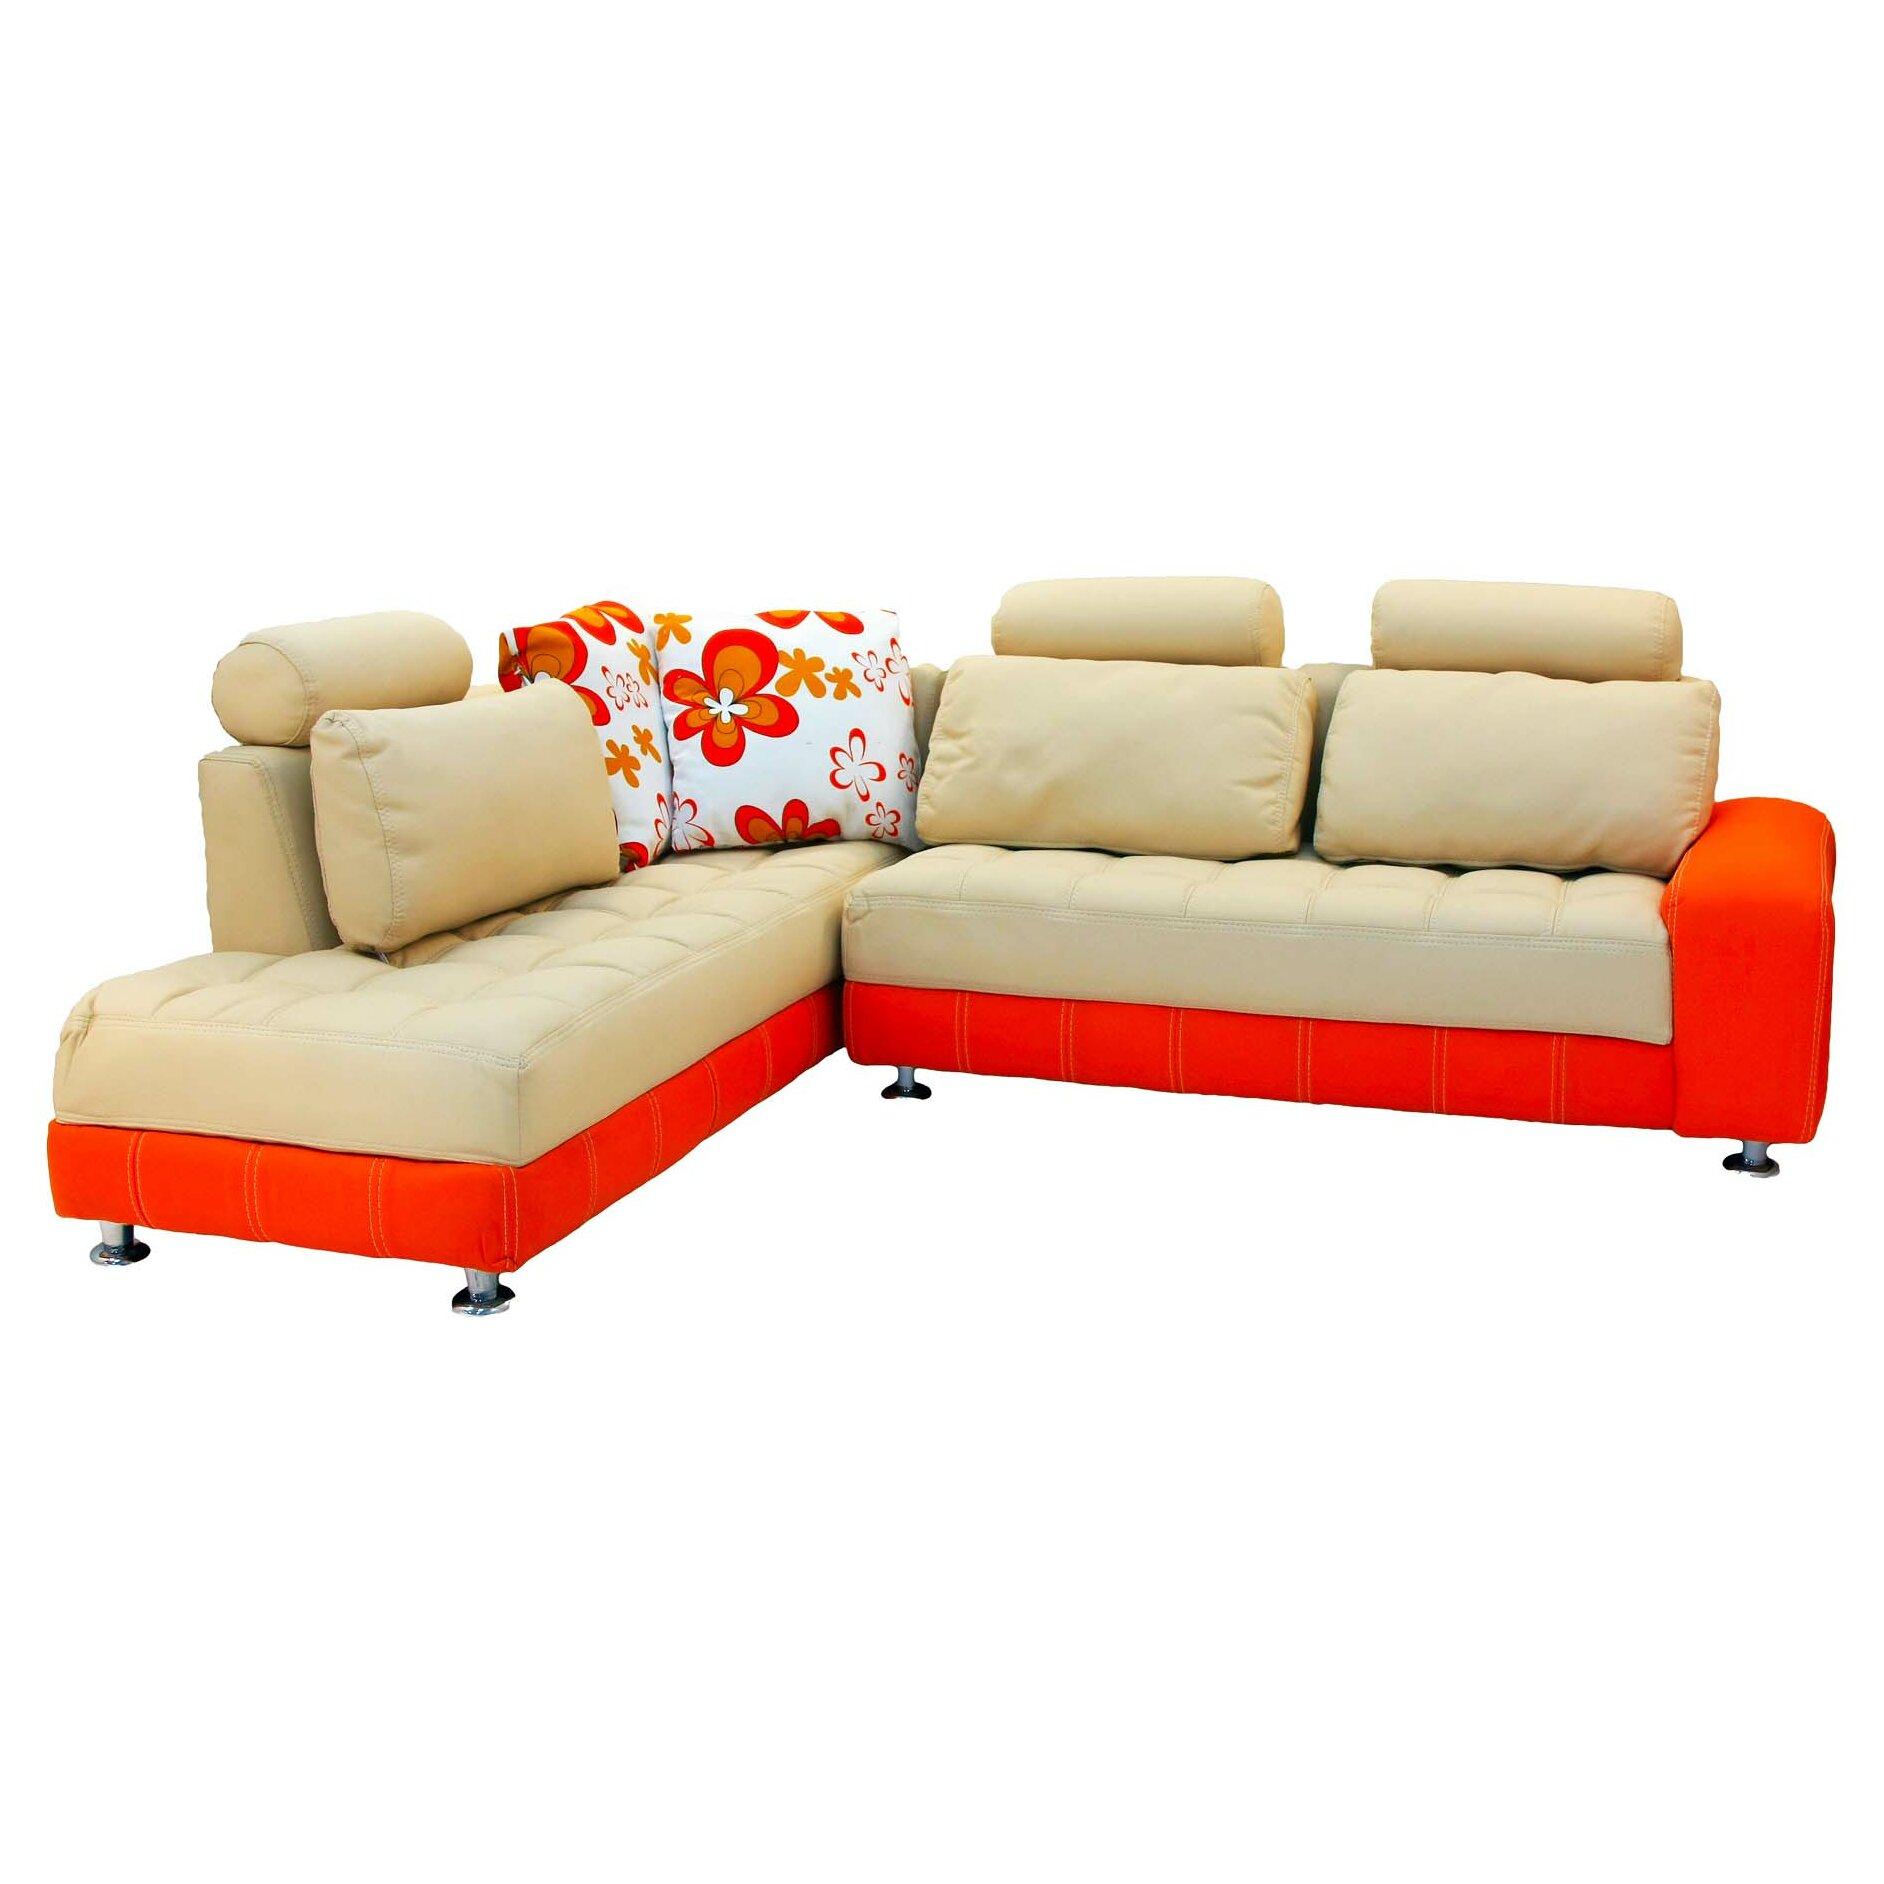 a+ child supply jessica 2 piece kids sofa set & reviews | wayfair